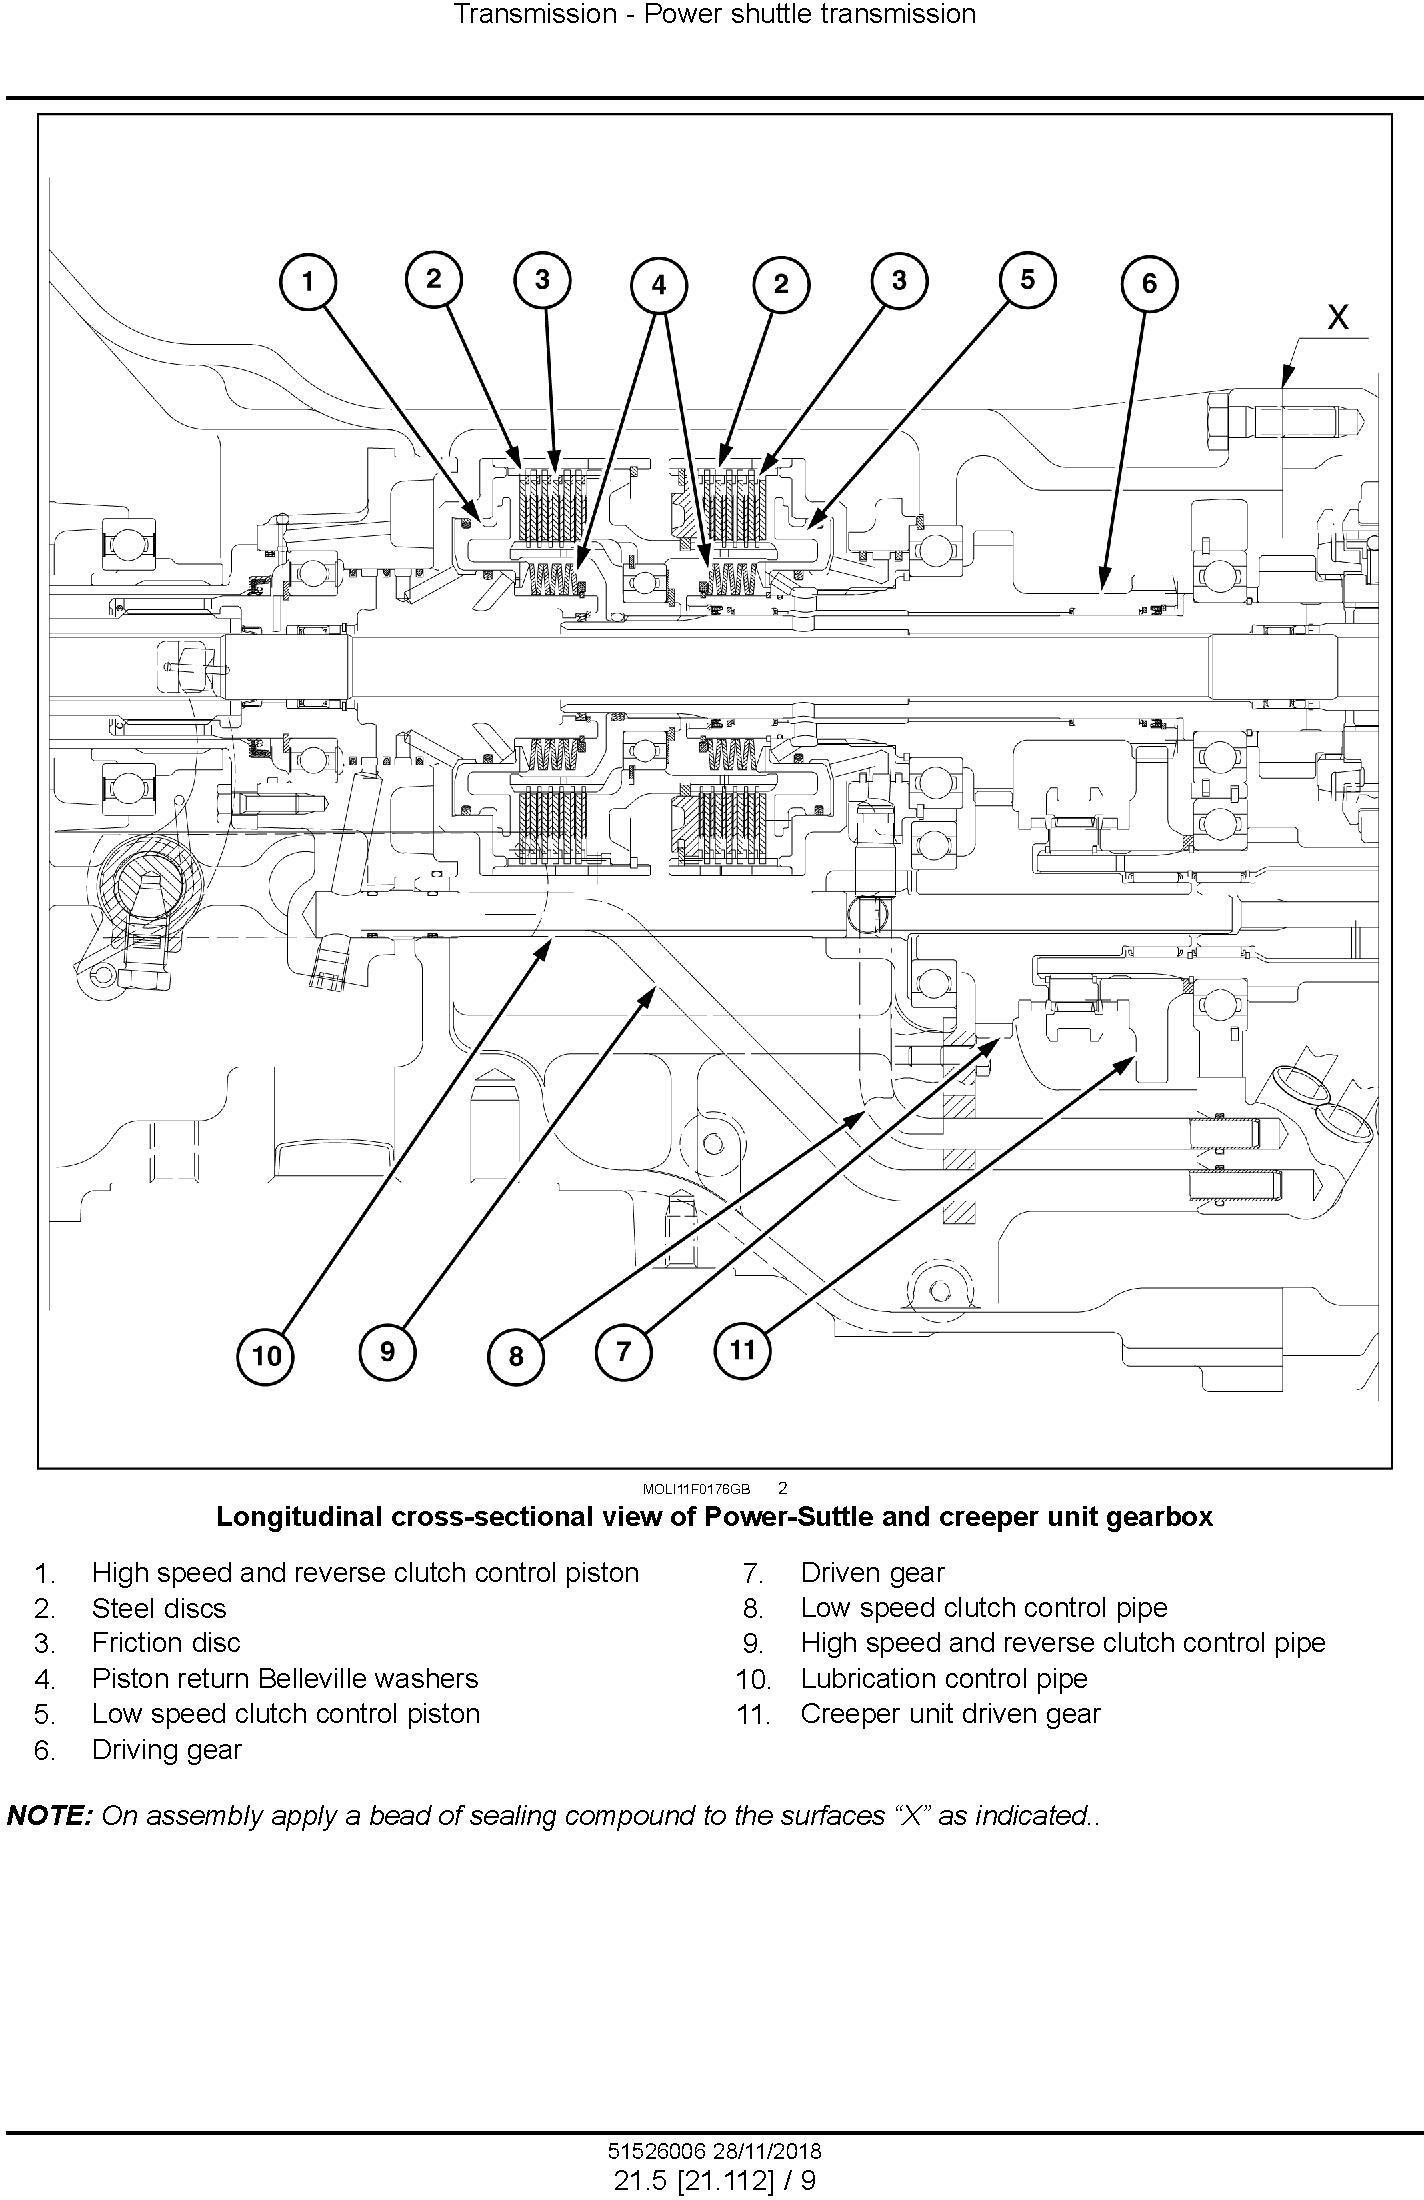 New Holland T4.80F/LP, T4.90F/LP, T4.100F/LP, T4.110F/LP Tier4A interim Tractor Service Manual (USA) - 2